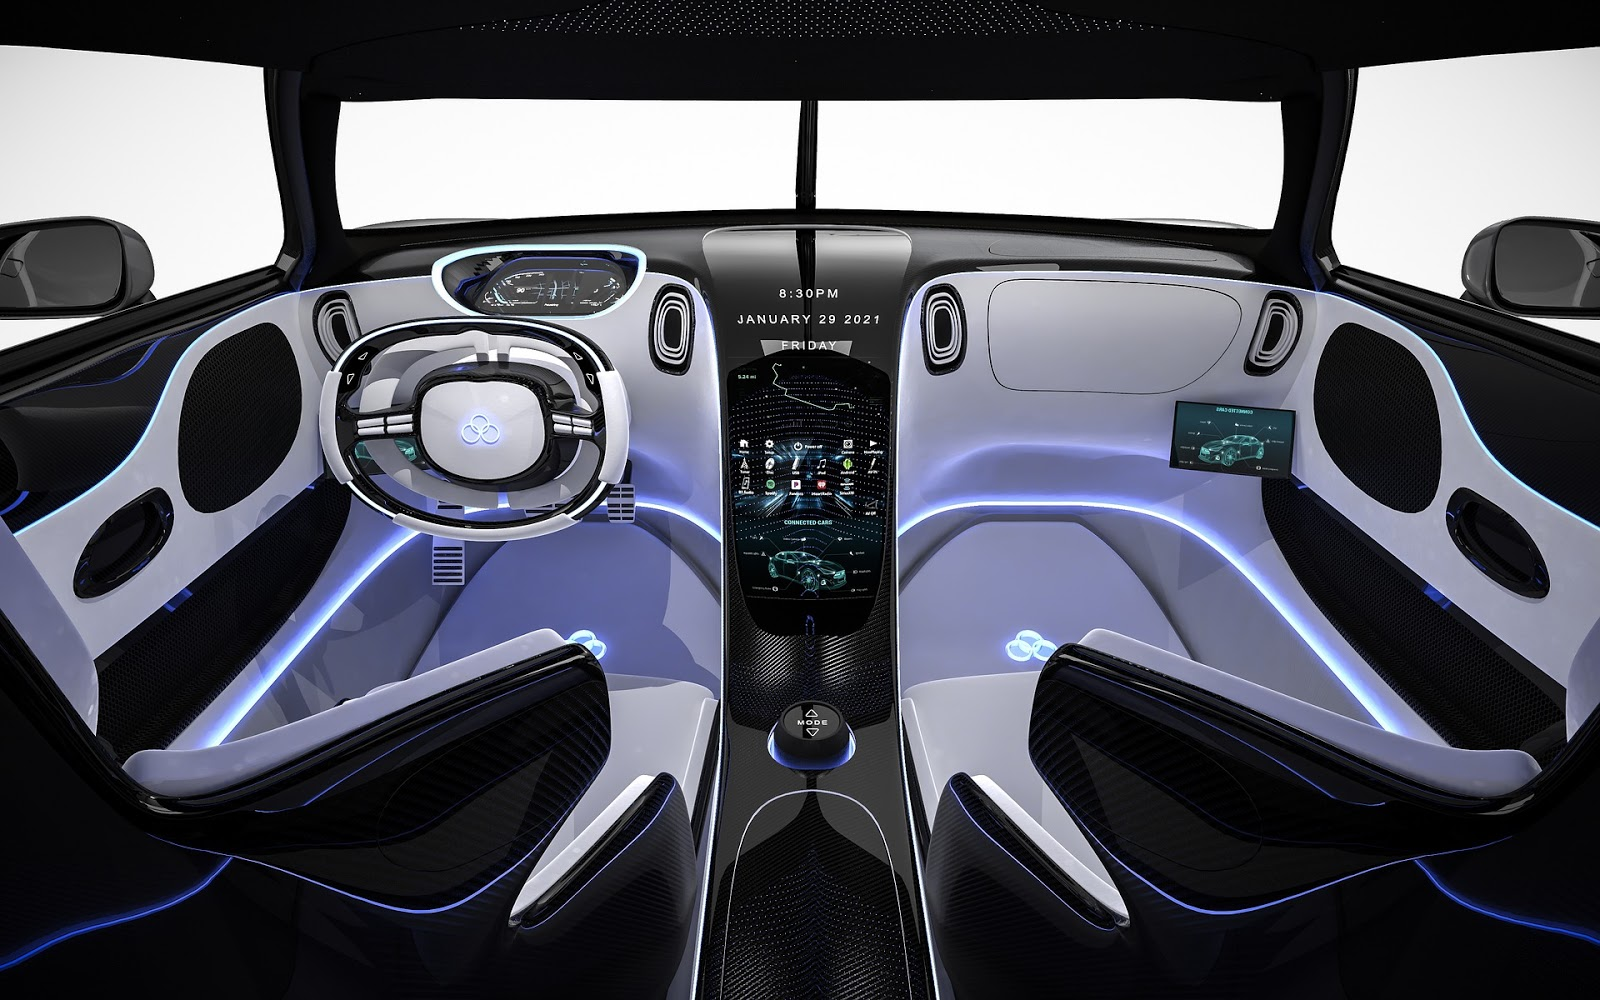 Dark imagery and luxury: black sports car interior